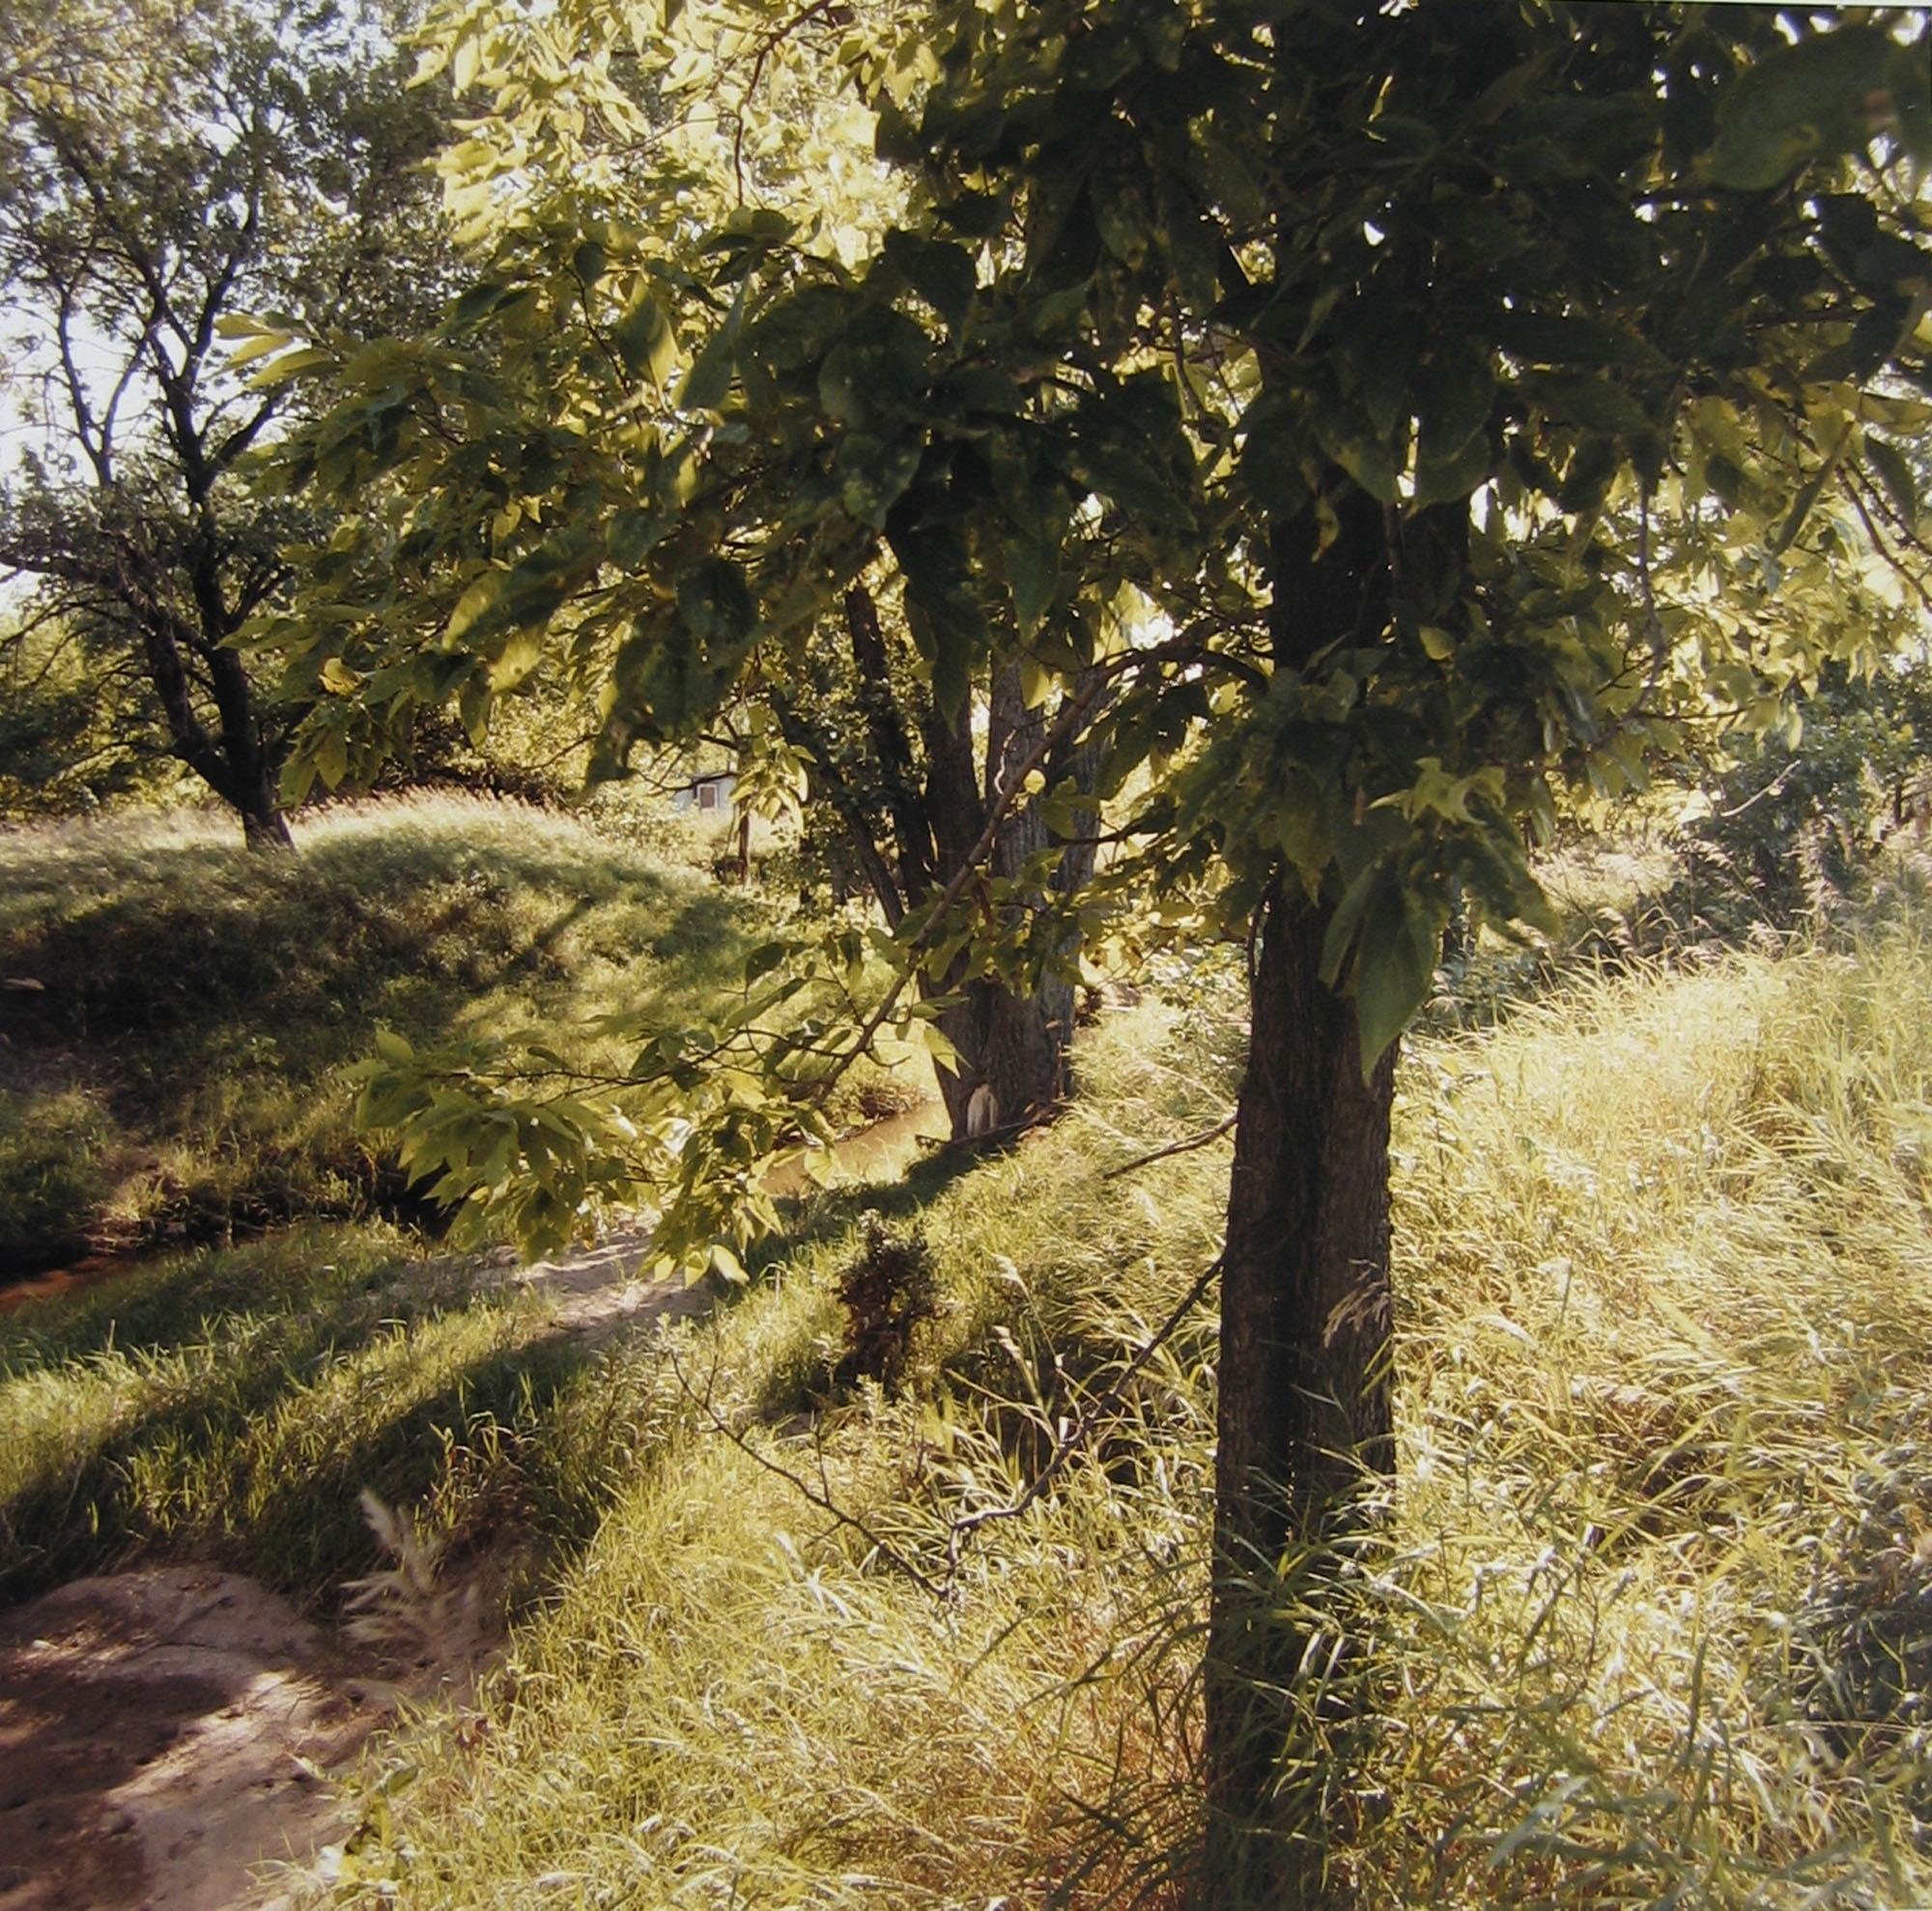 By Prairie Creek, Sunday, July 28, 1996